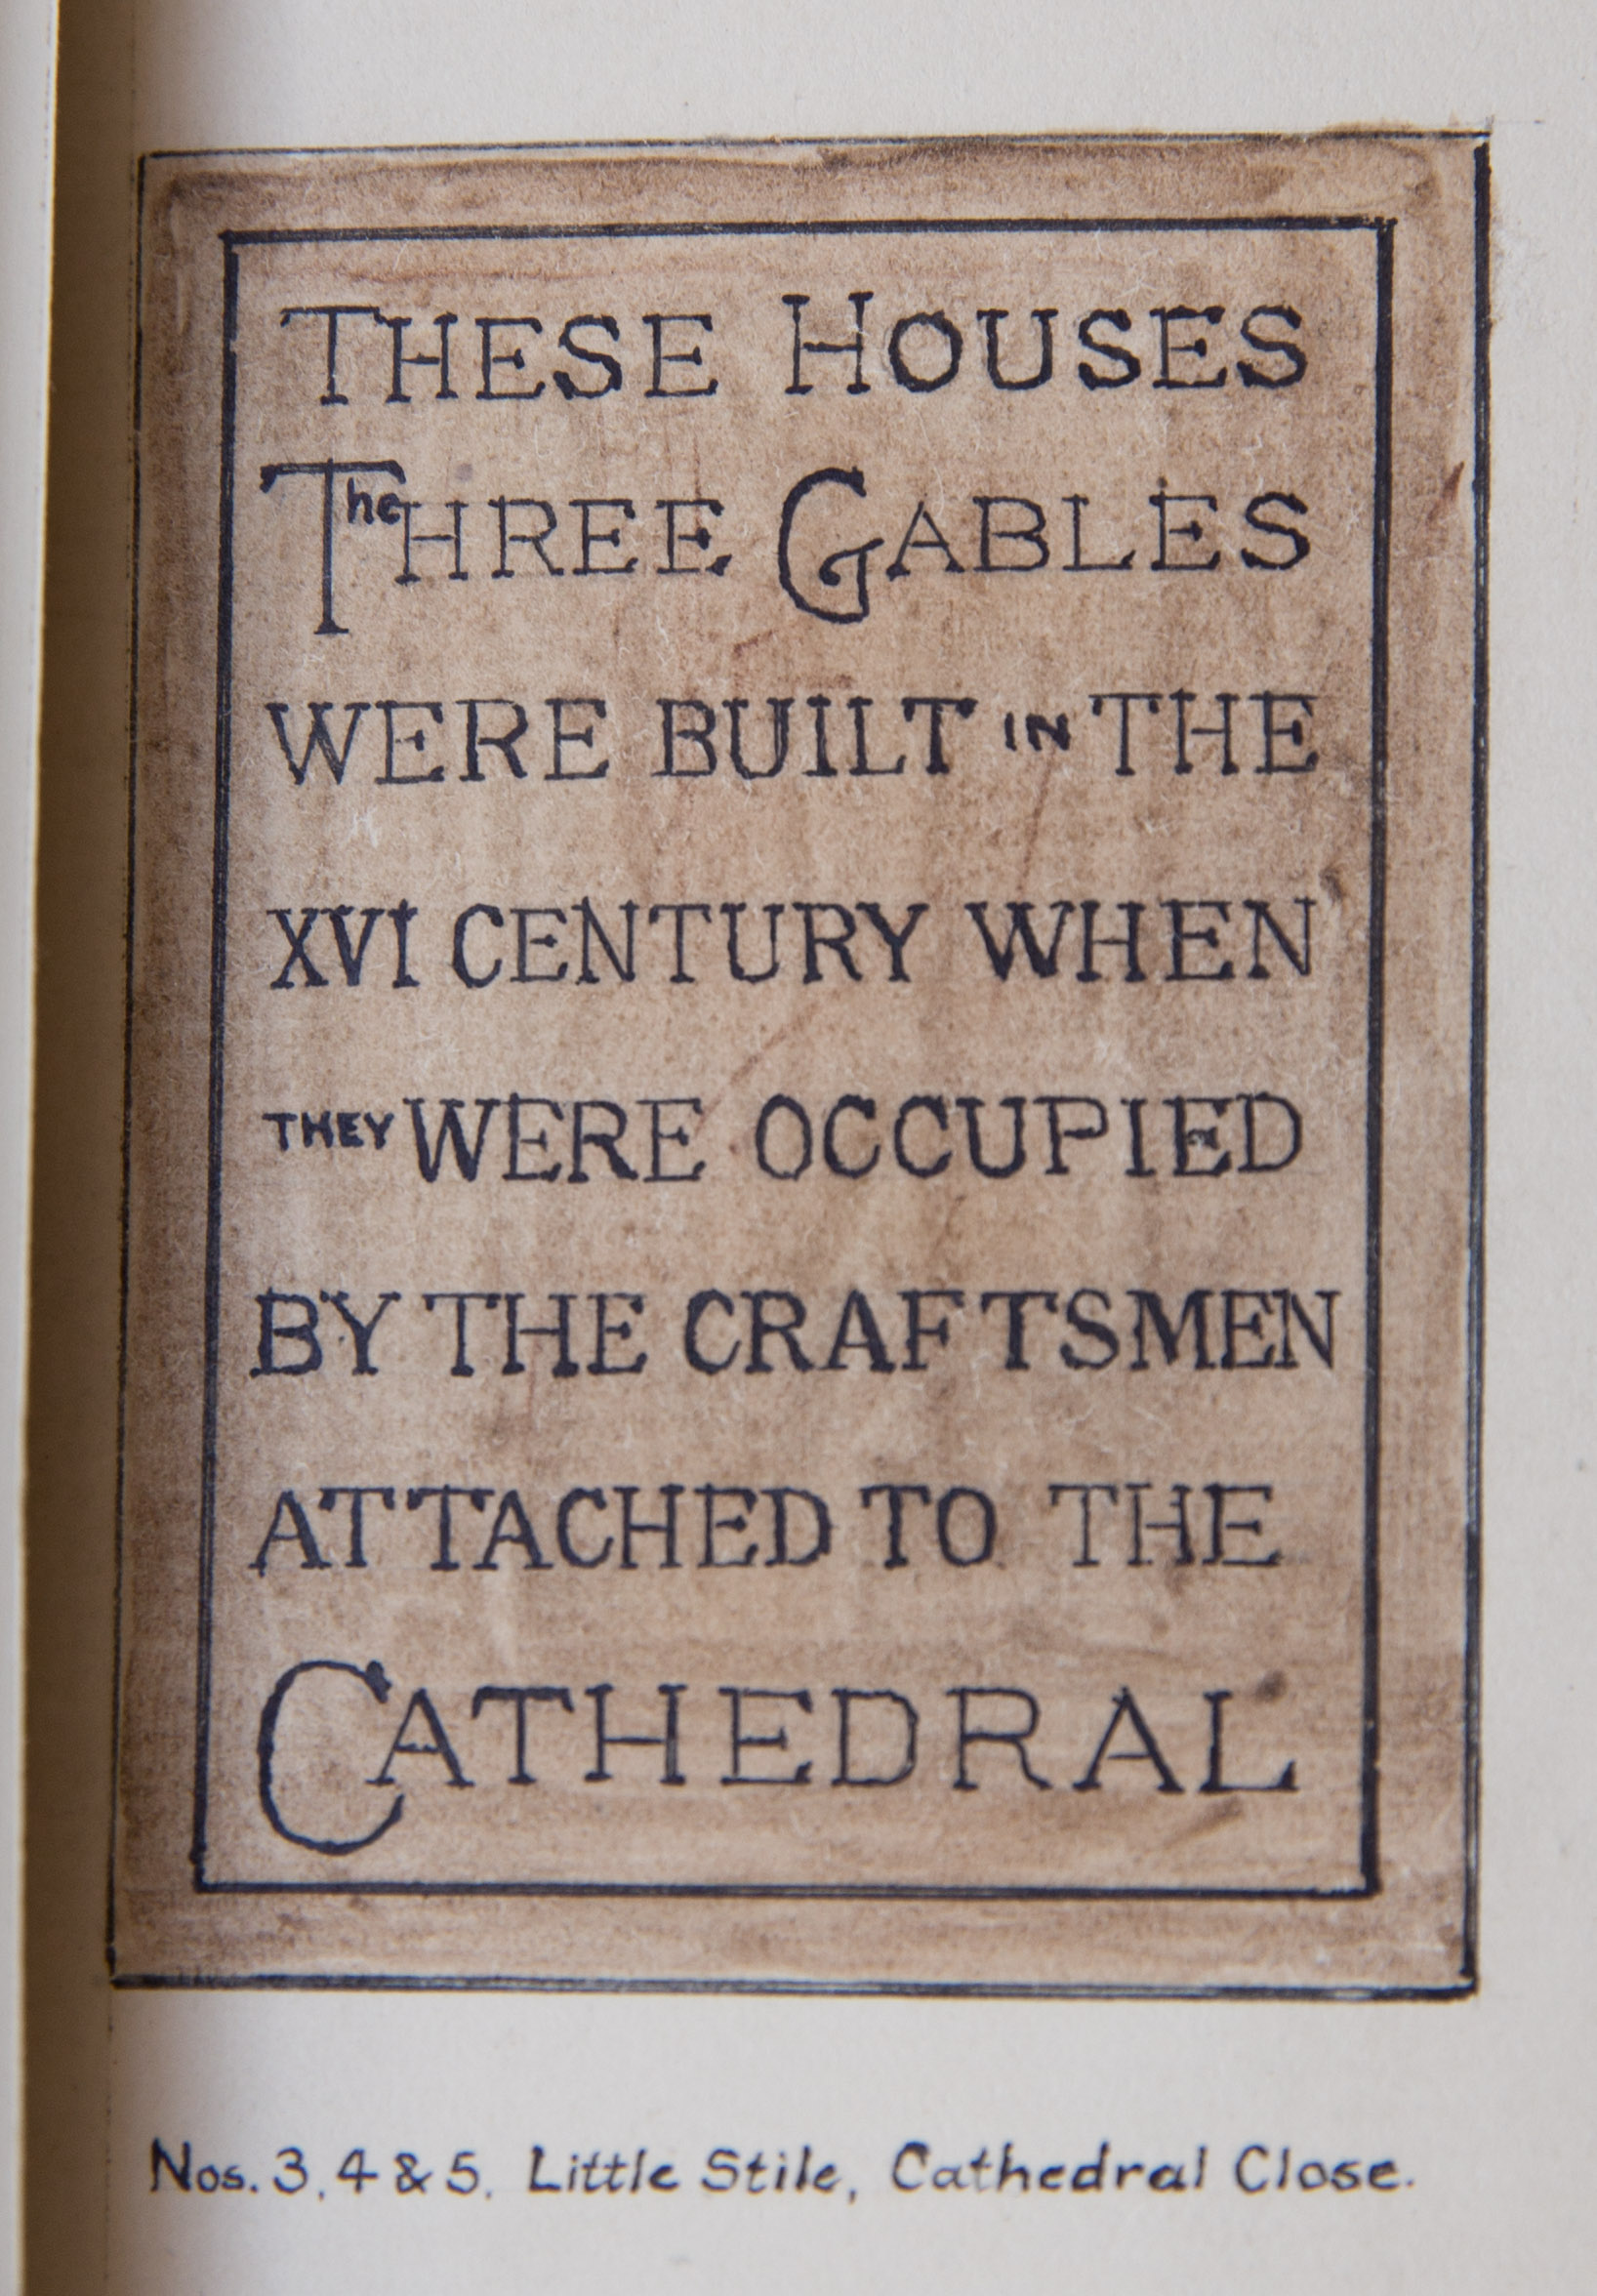 The Three Gables